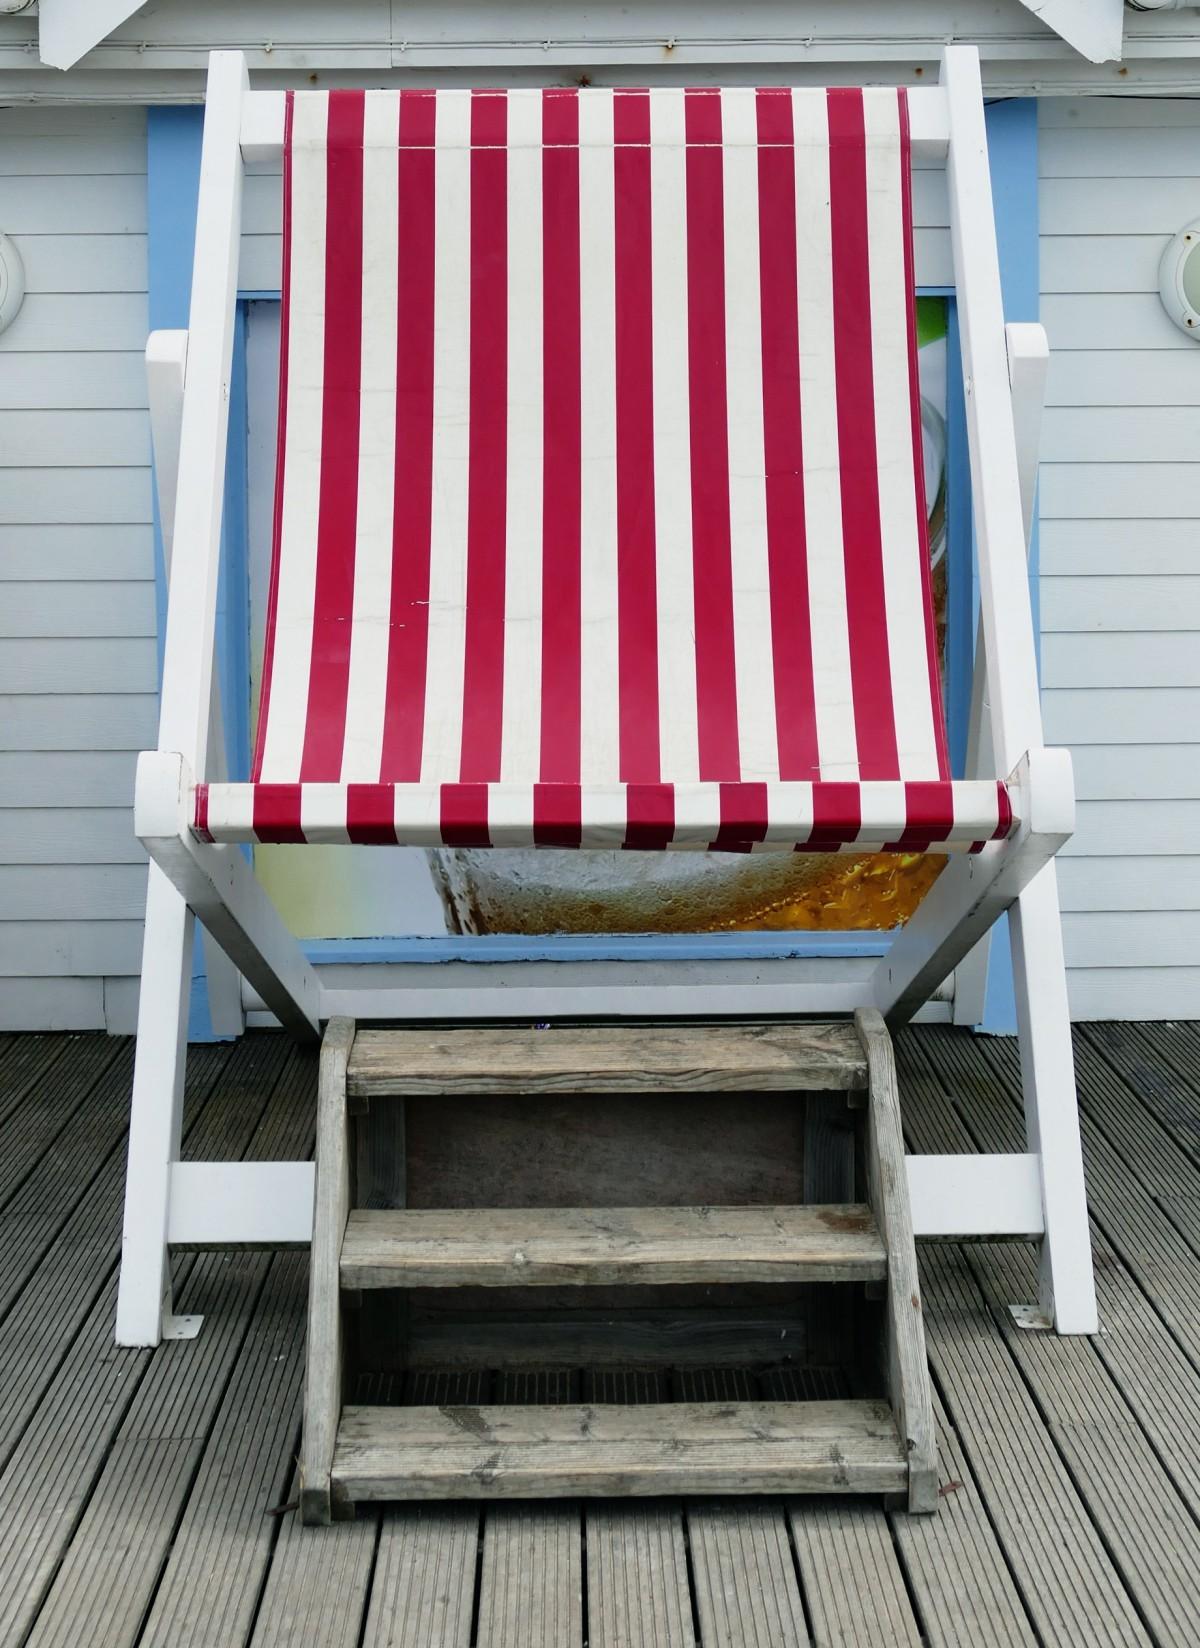 free images outdoor sun vacation recreation sunbathing